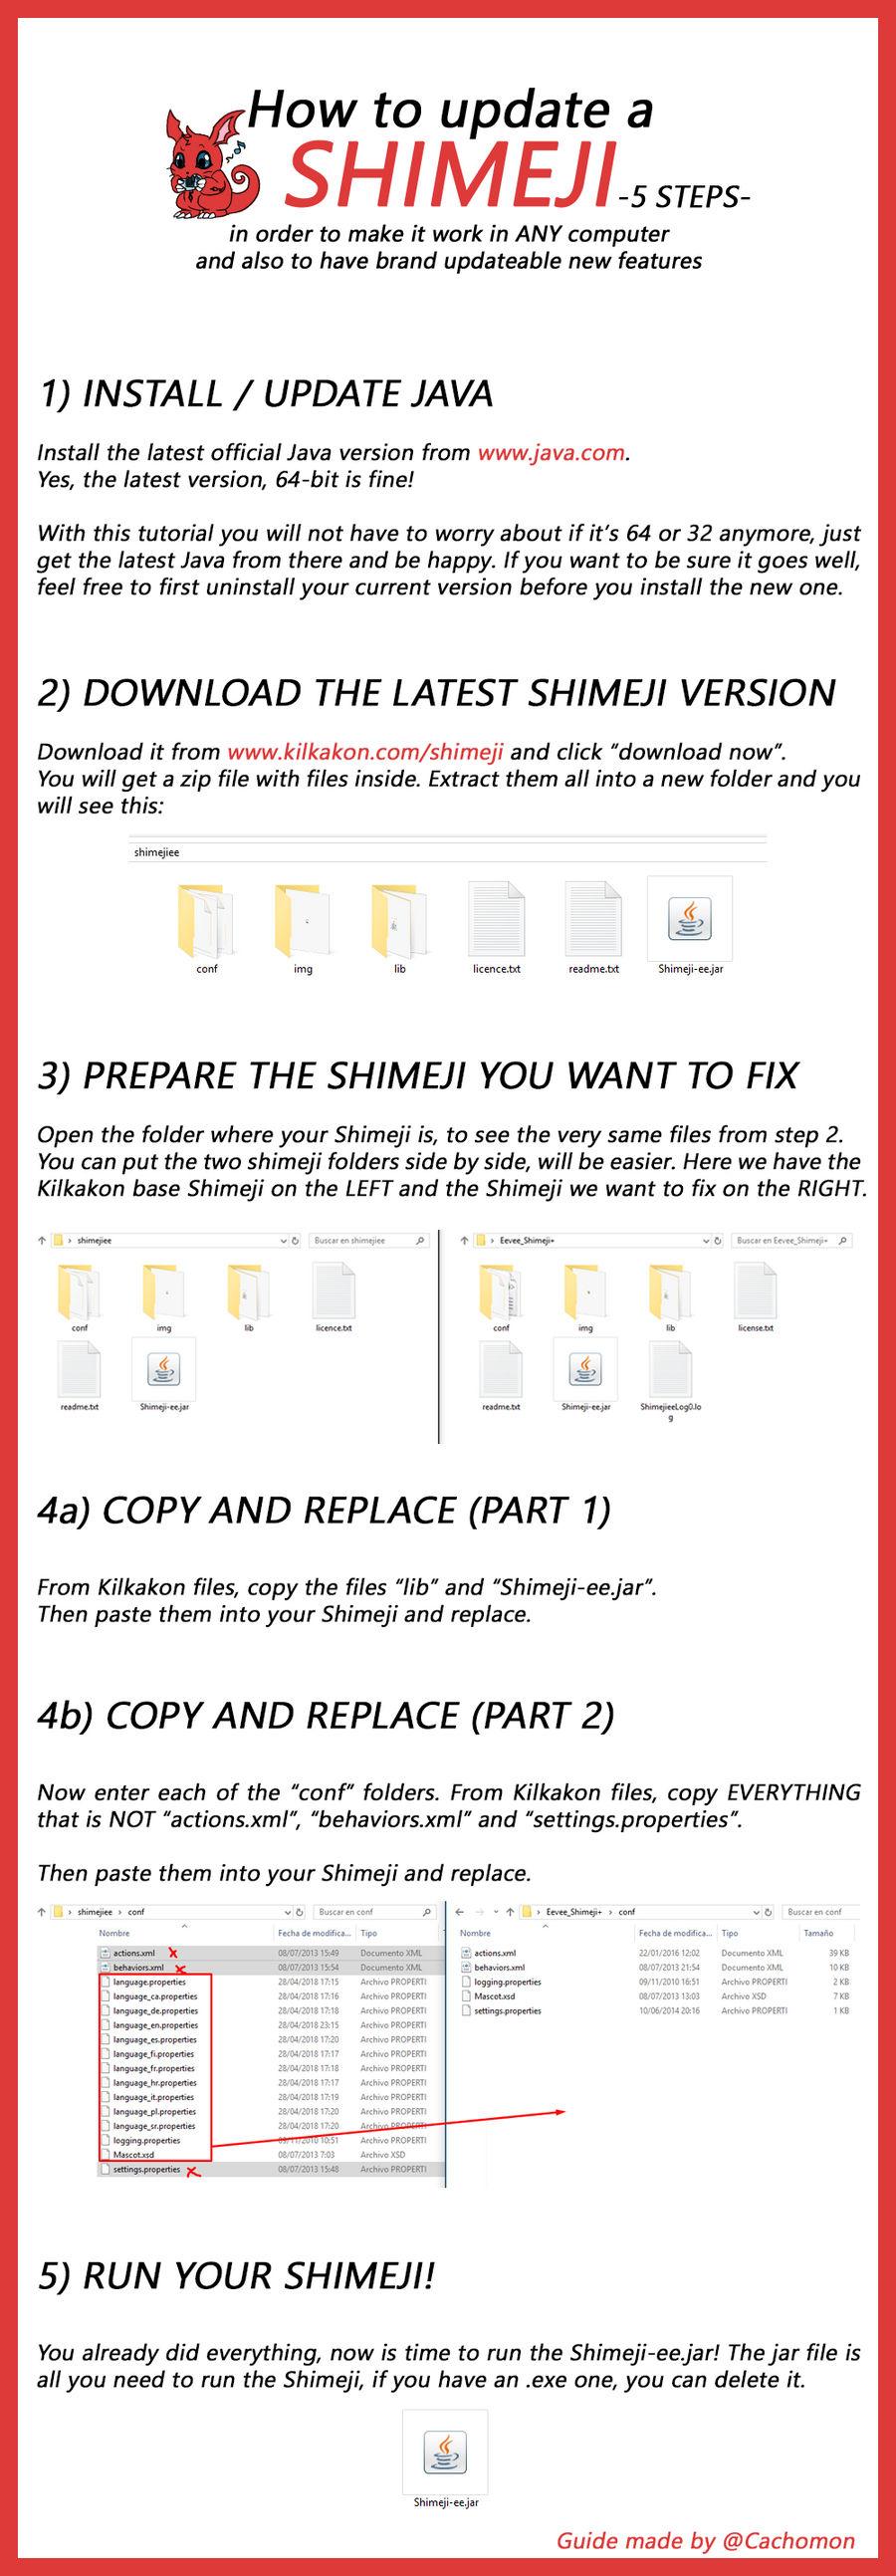 How to make SHIMEJI work no matter what [TUTORIAL]